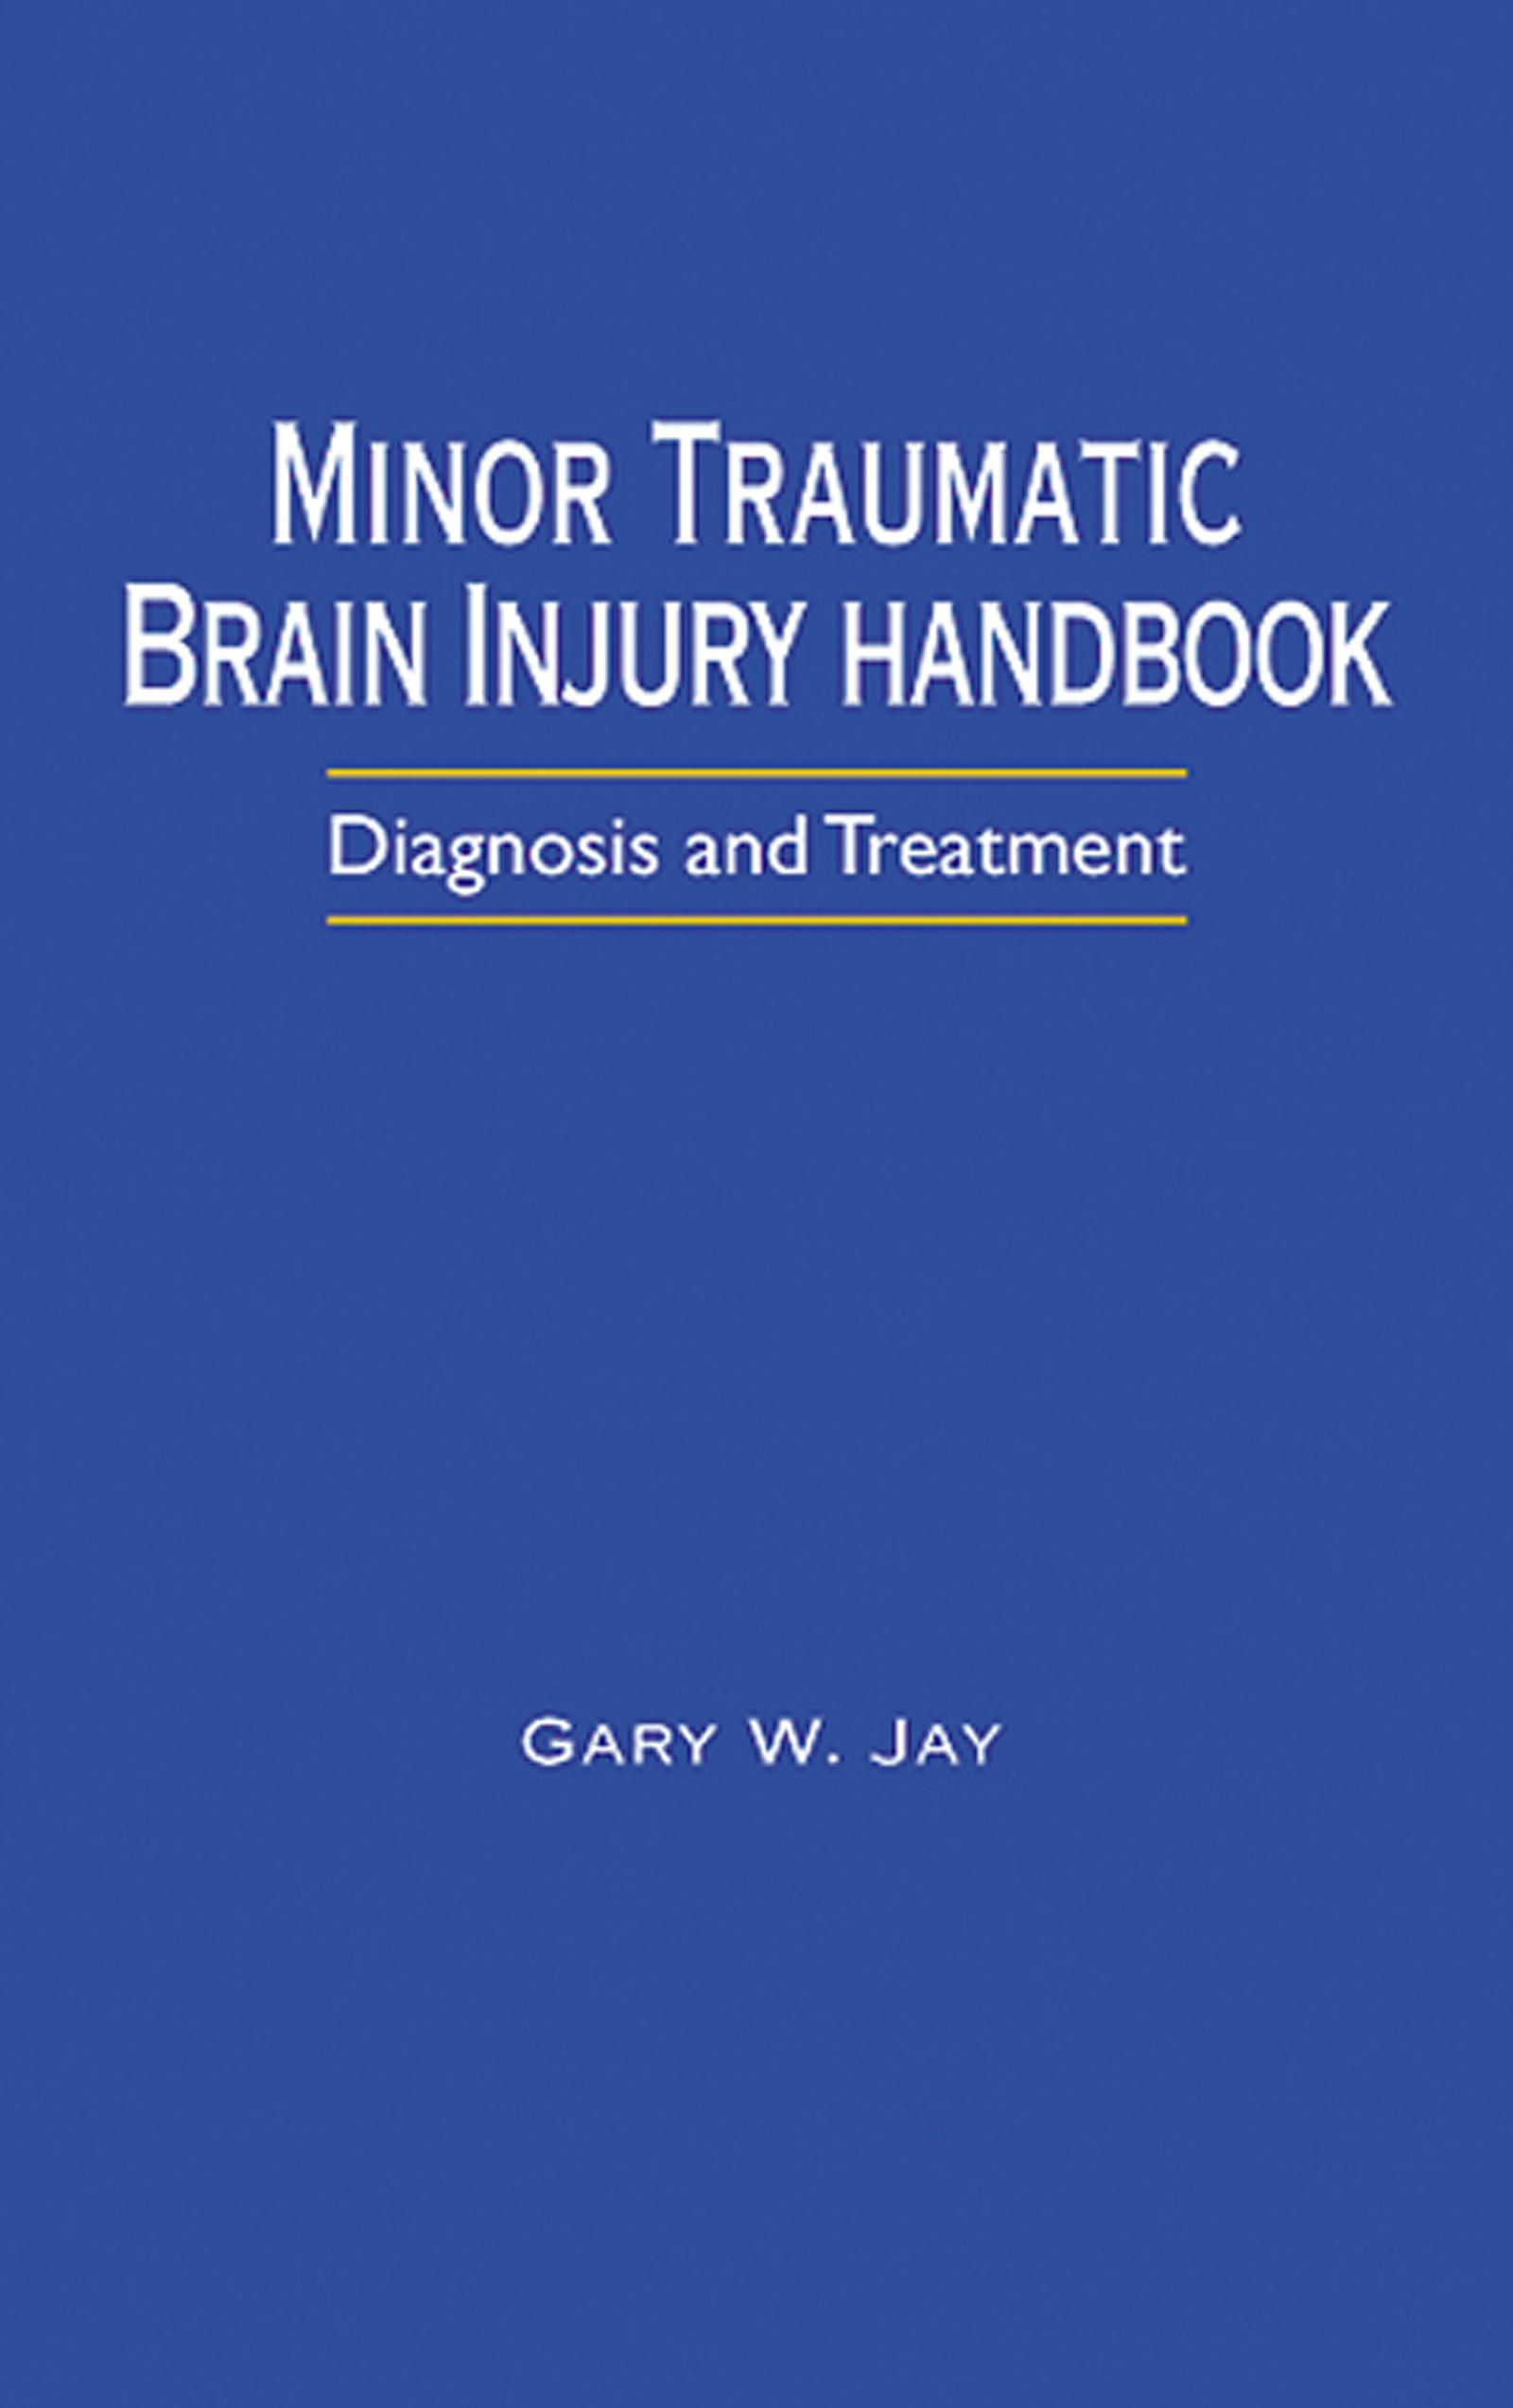 What is Mild Traumatic Brain Injury?